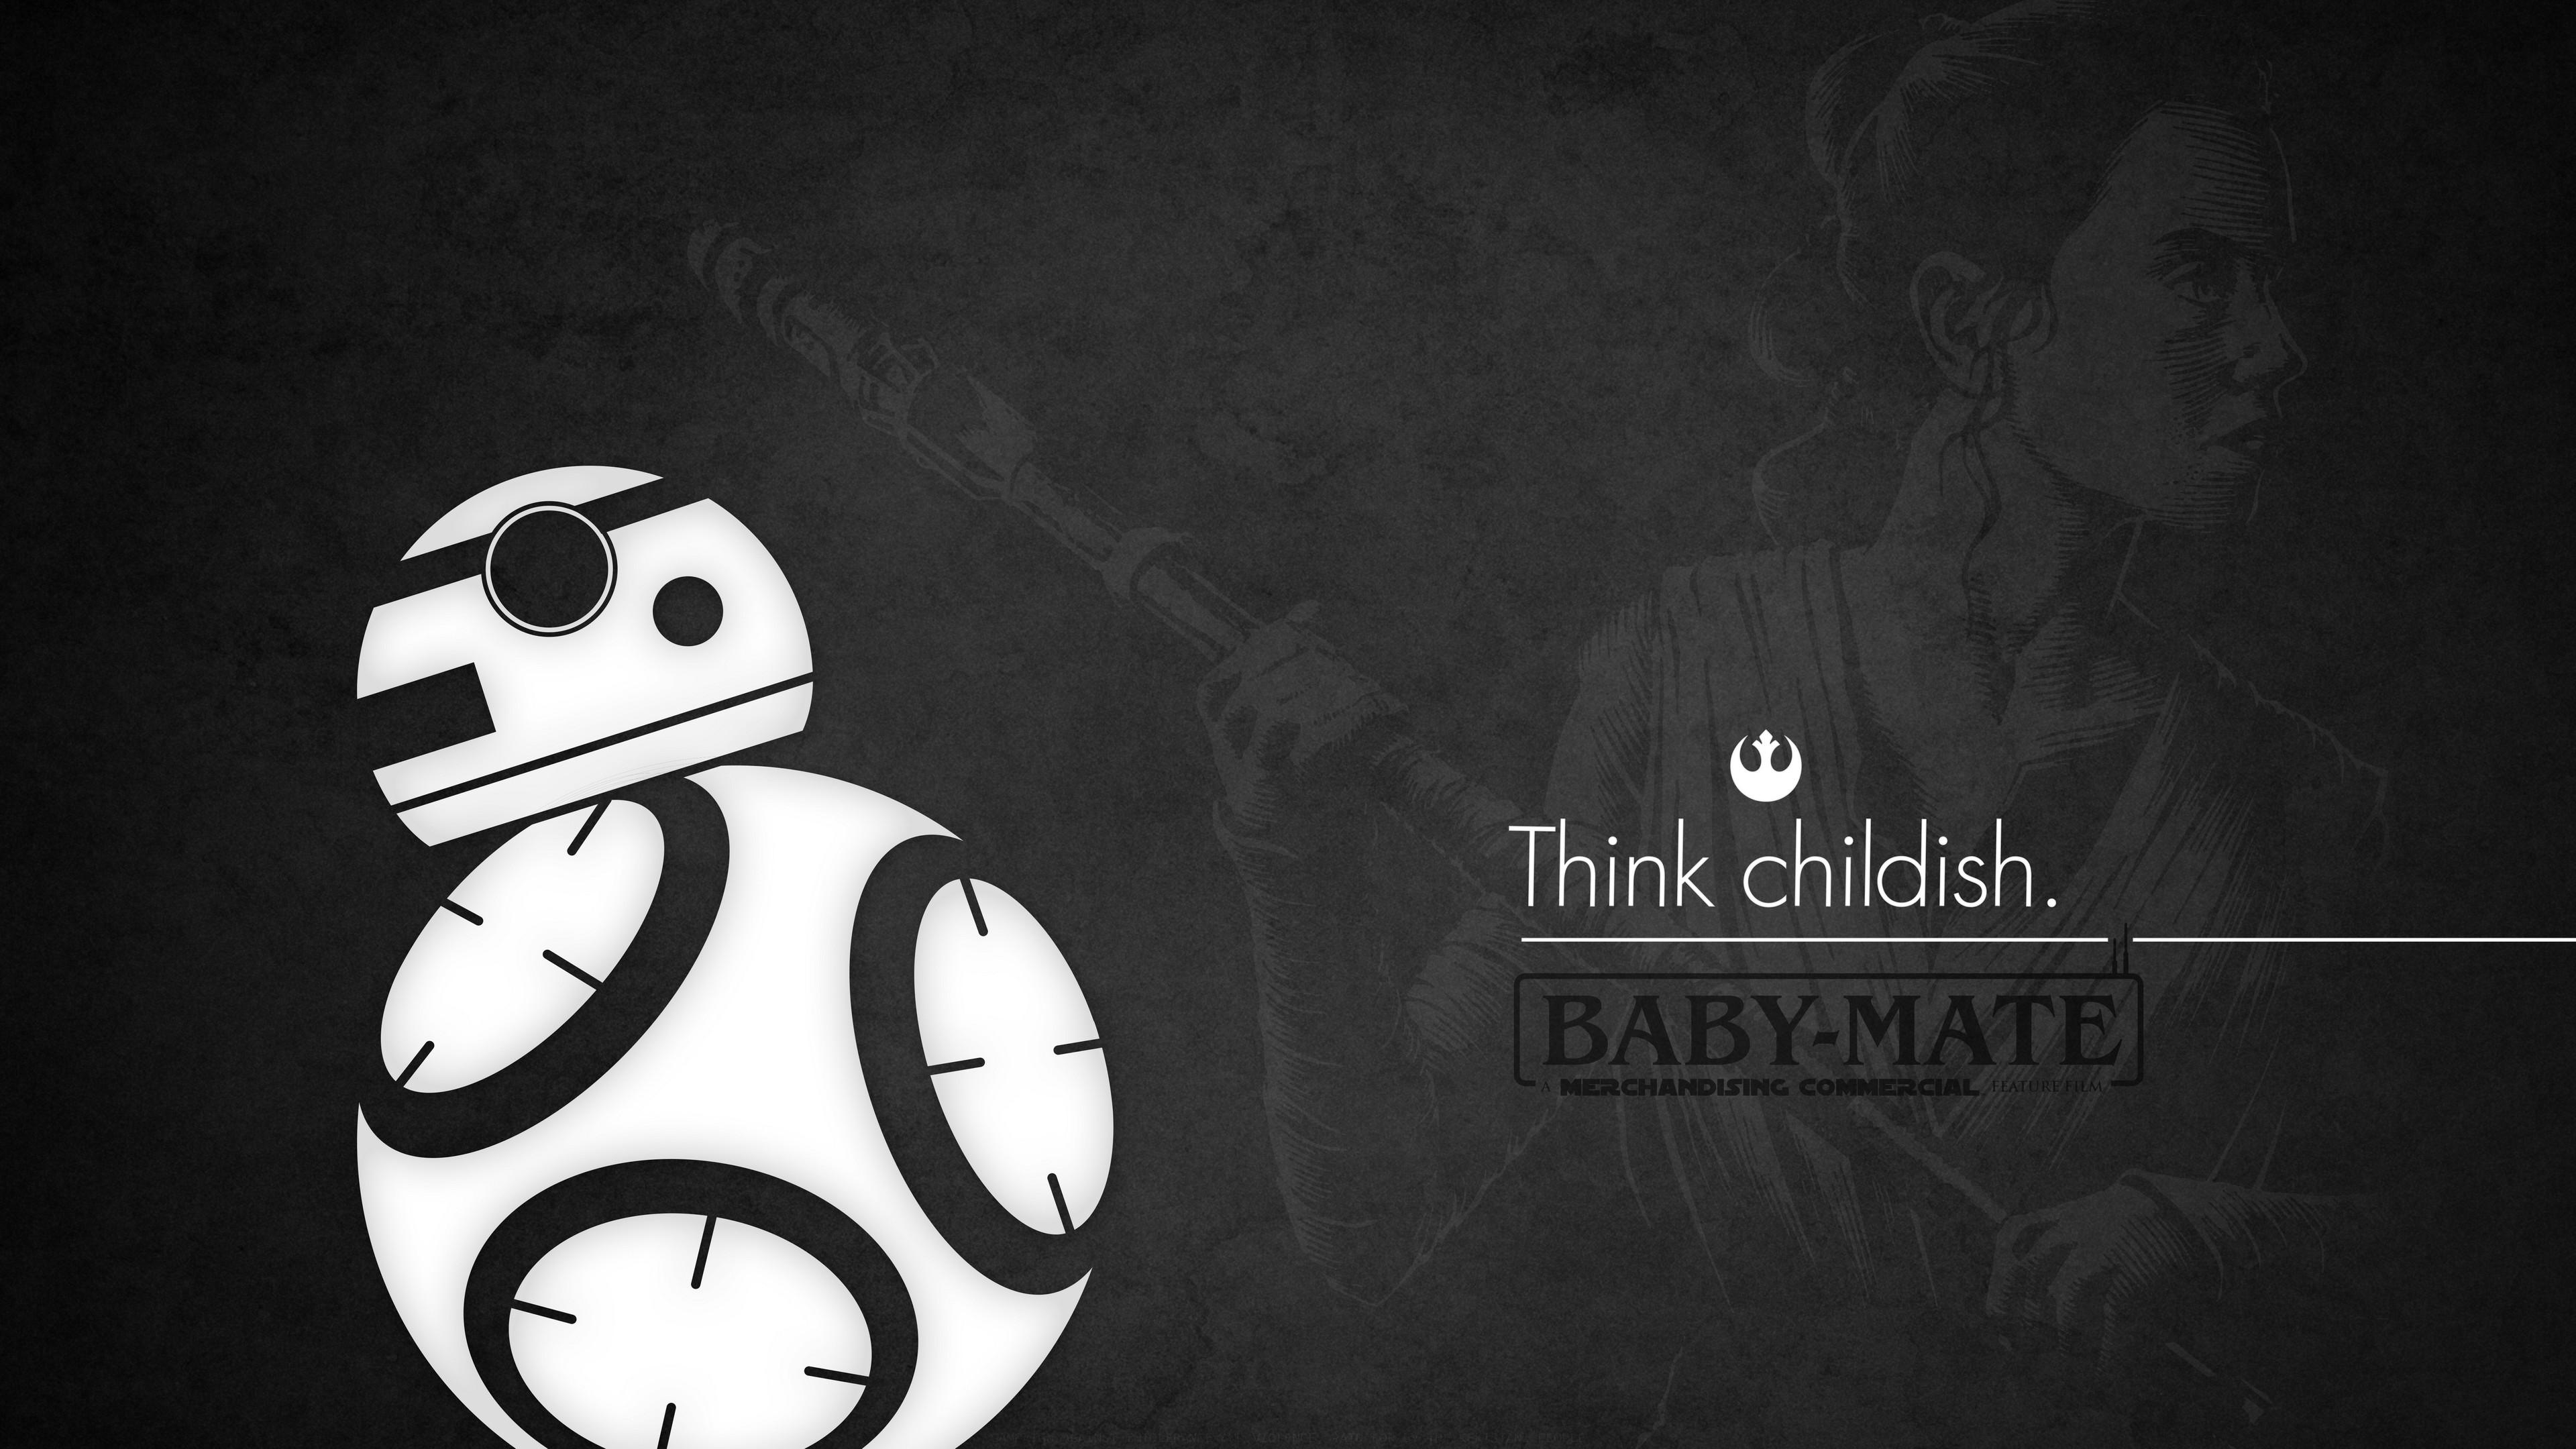 Star Wars The Last Jedi Wallpaper 8k Ben Solo